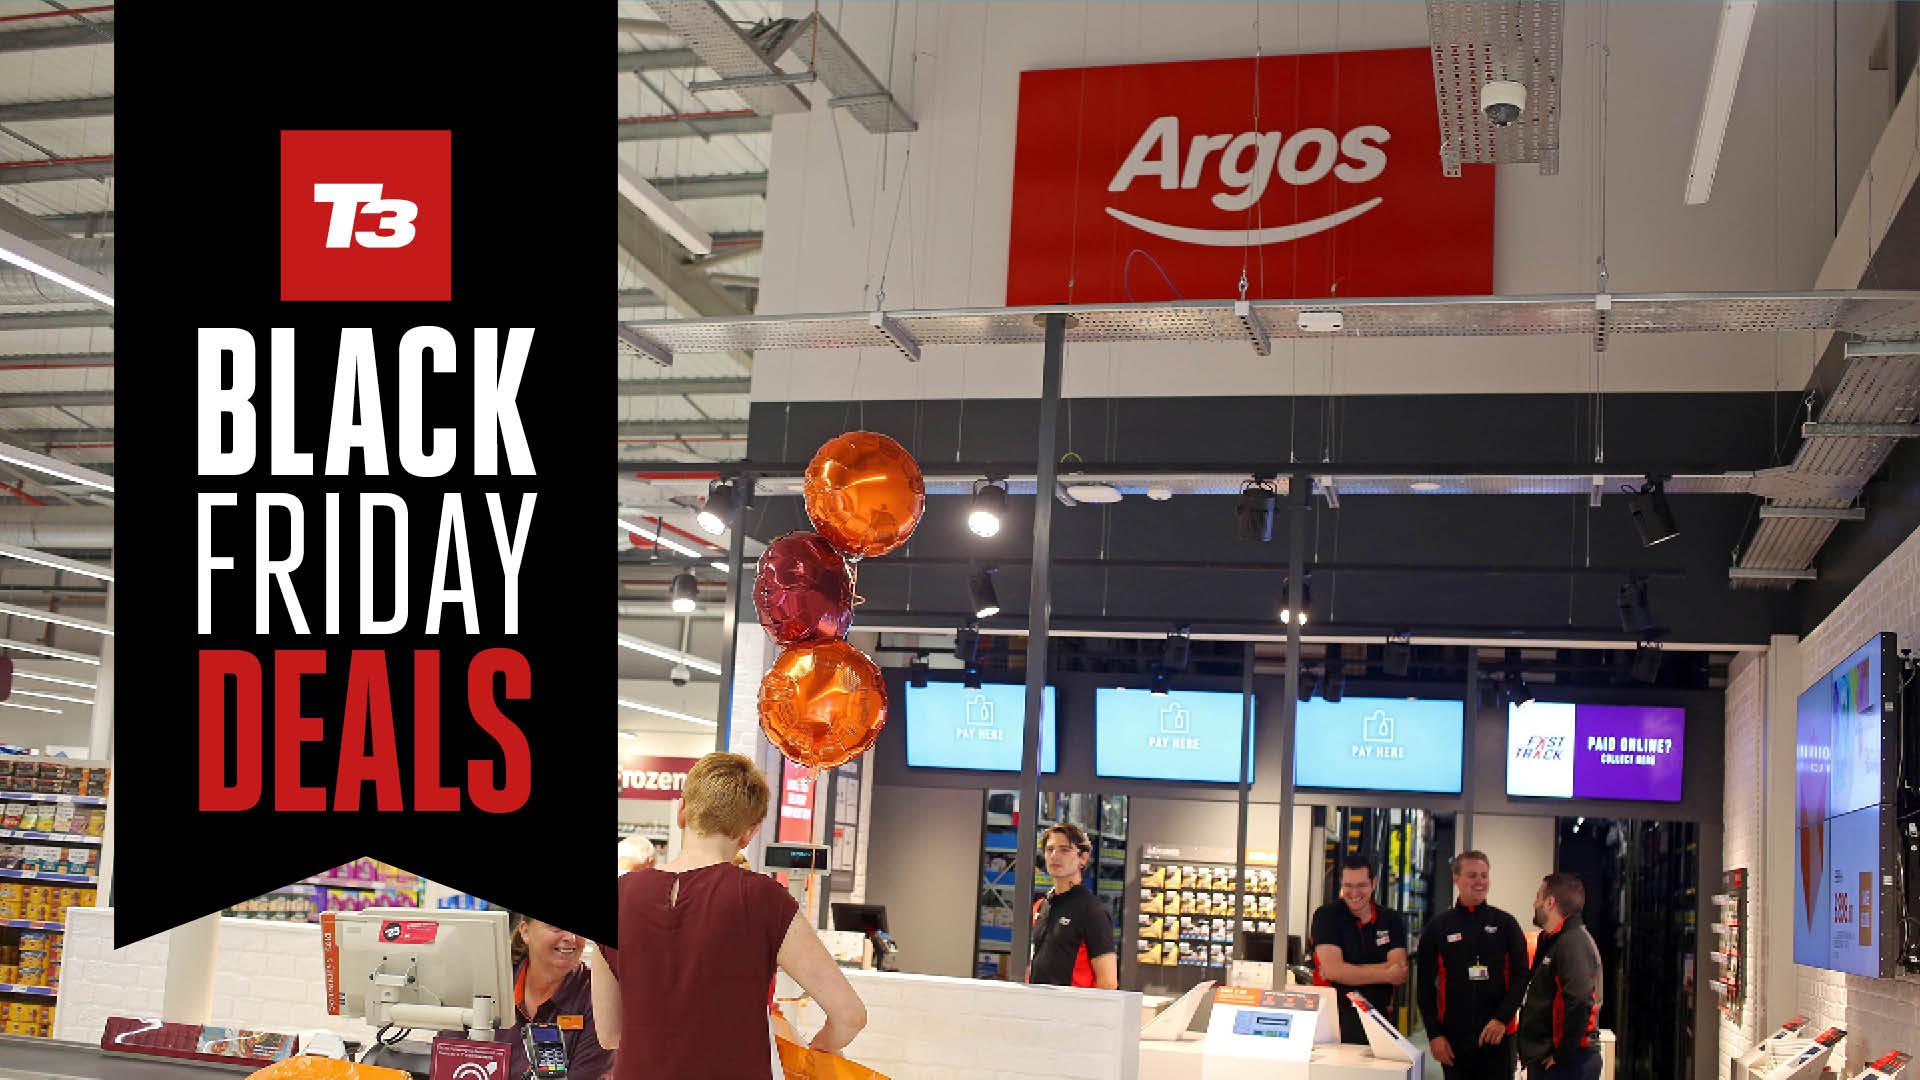 Argos Cyber Monday Deals These Best Deals End Soon T3 inside dimensions 1920 X 1080